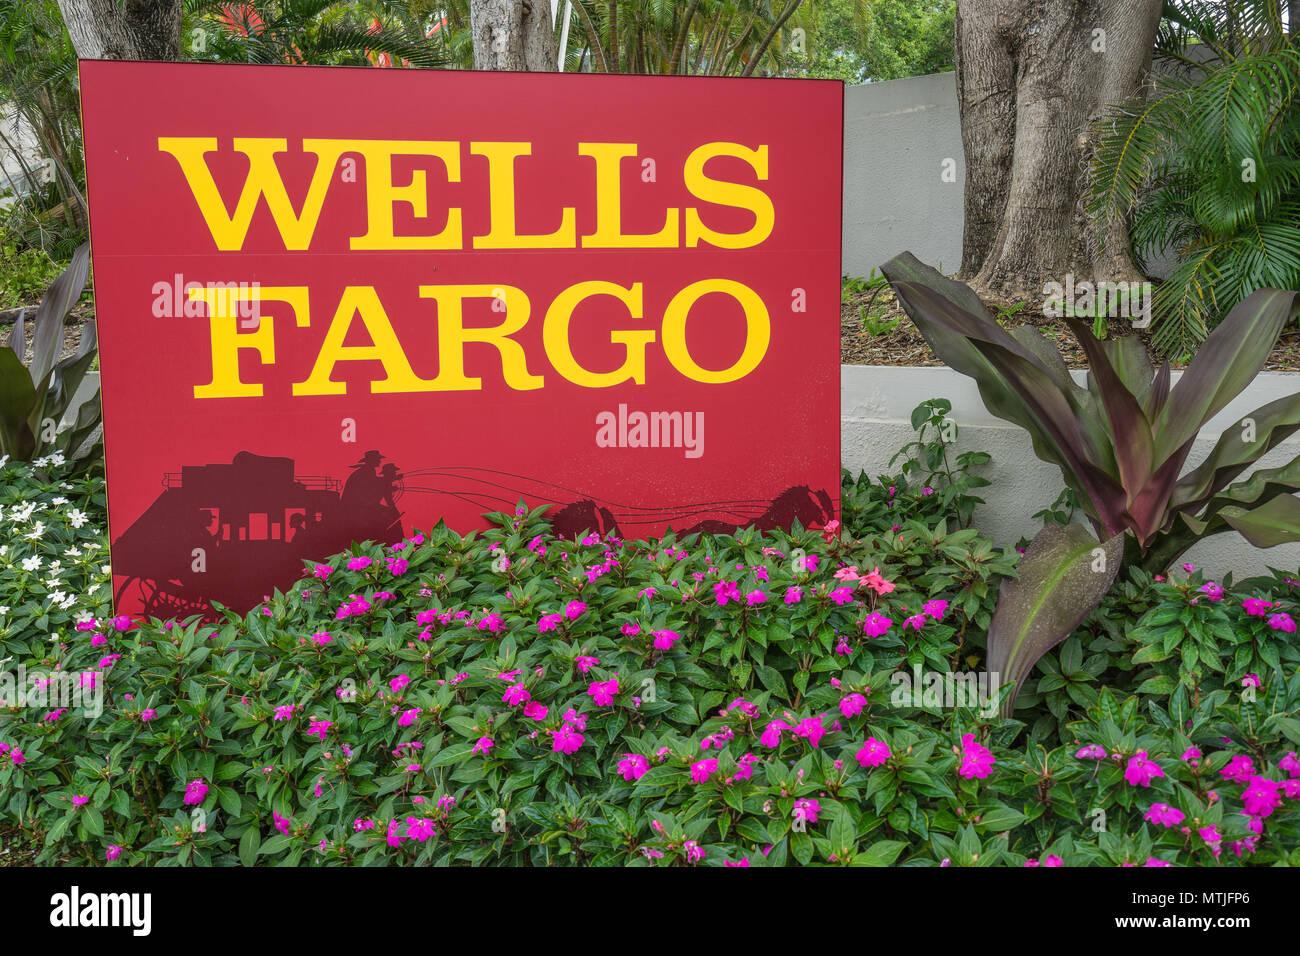 Wells Fargo Financial Services Stockbild